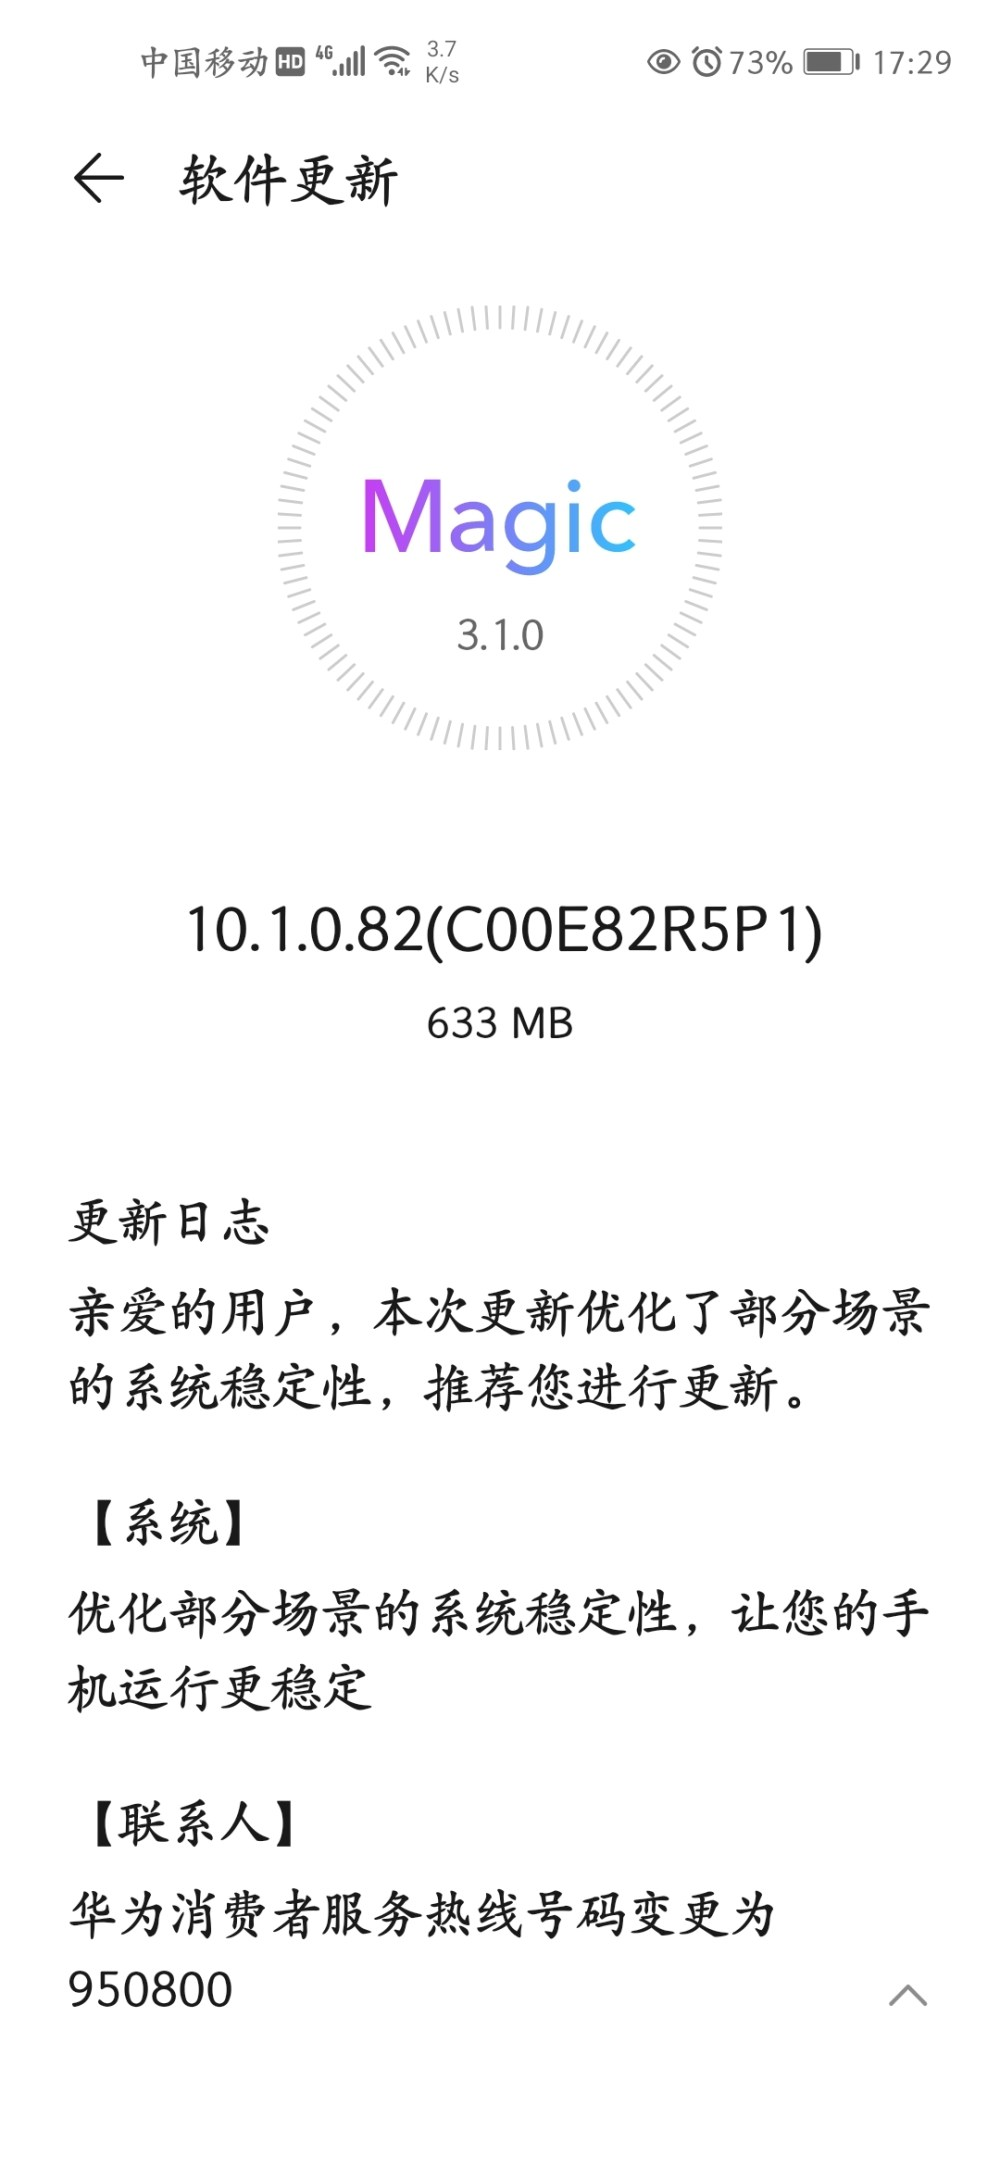 Honor 20S Magic UI 3.1 new beta version 10.1.0.82